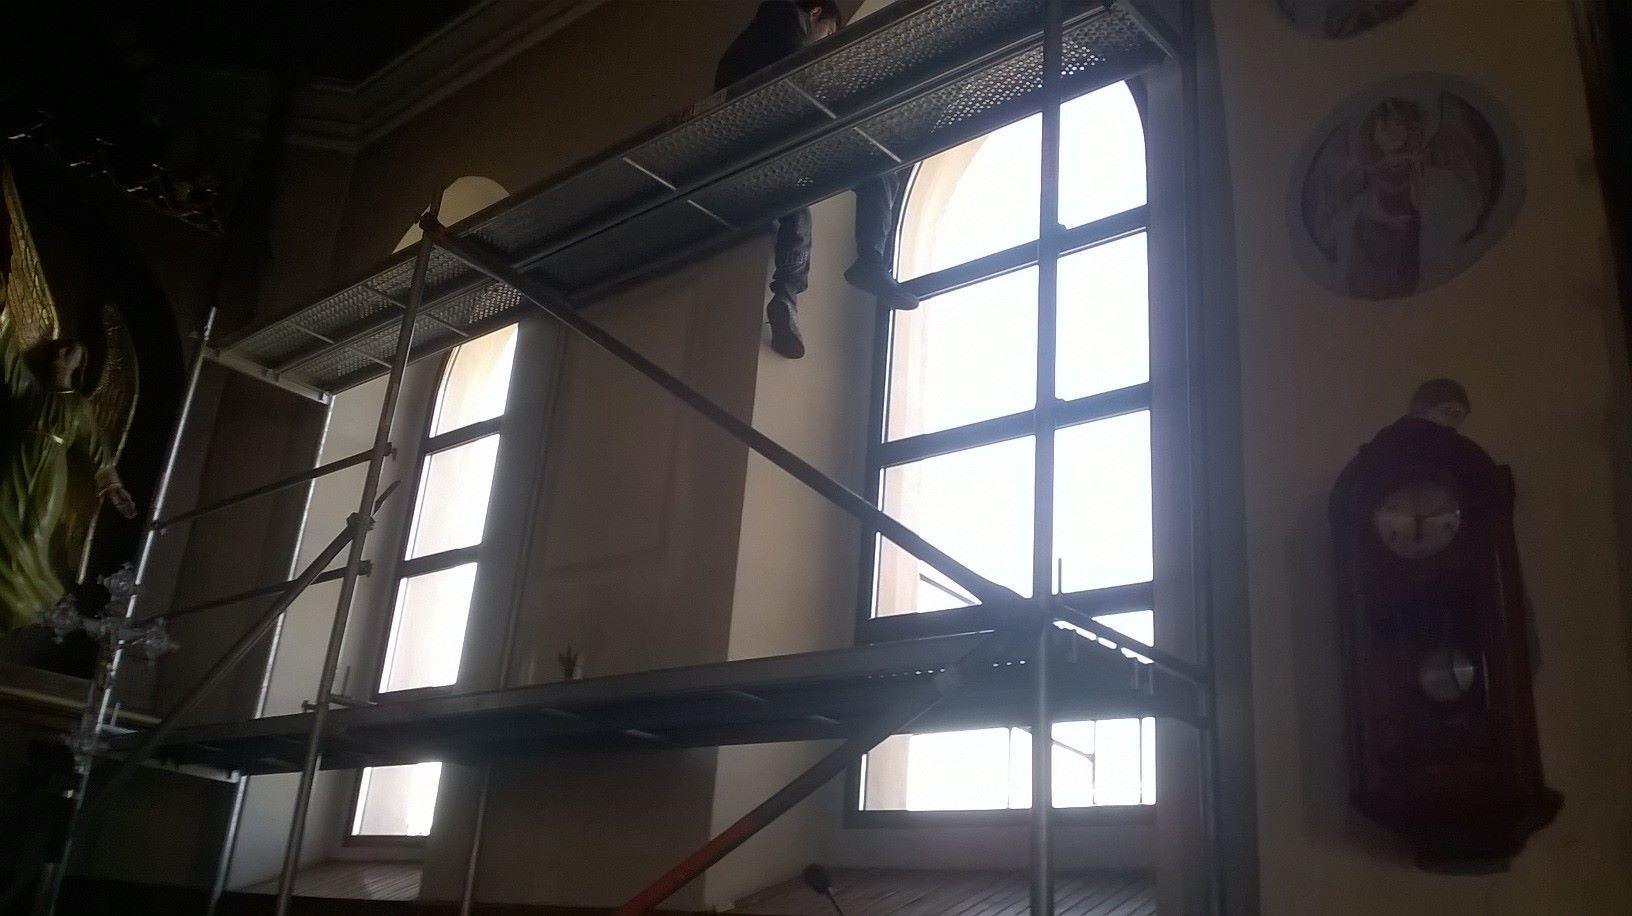 Okna Kozioł UG Kozioł stolarka PCV drzwi bramy